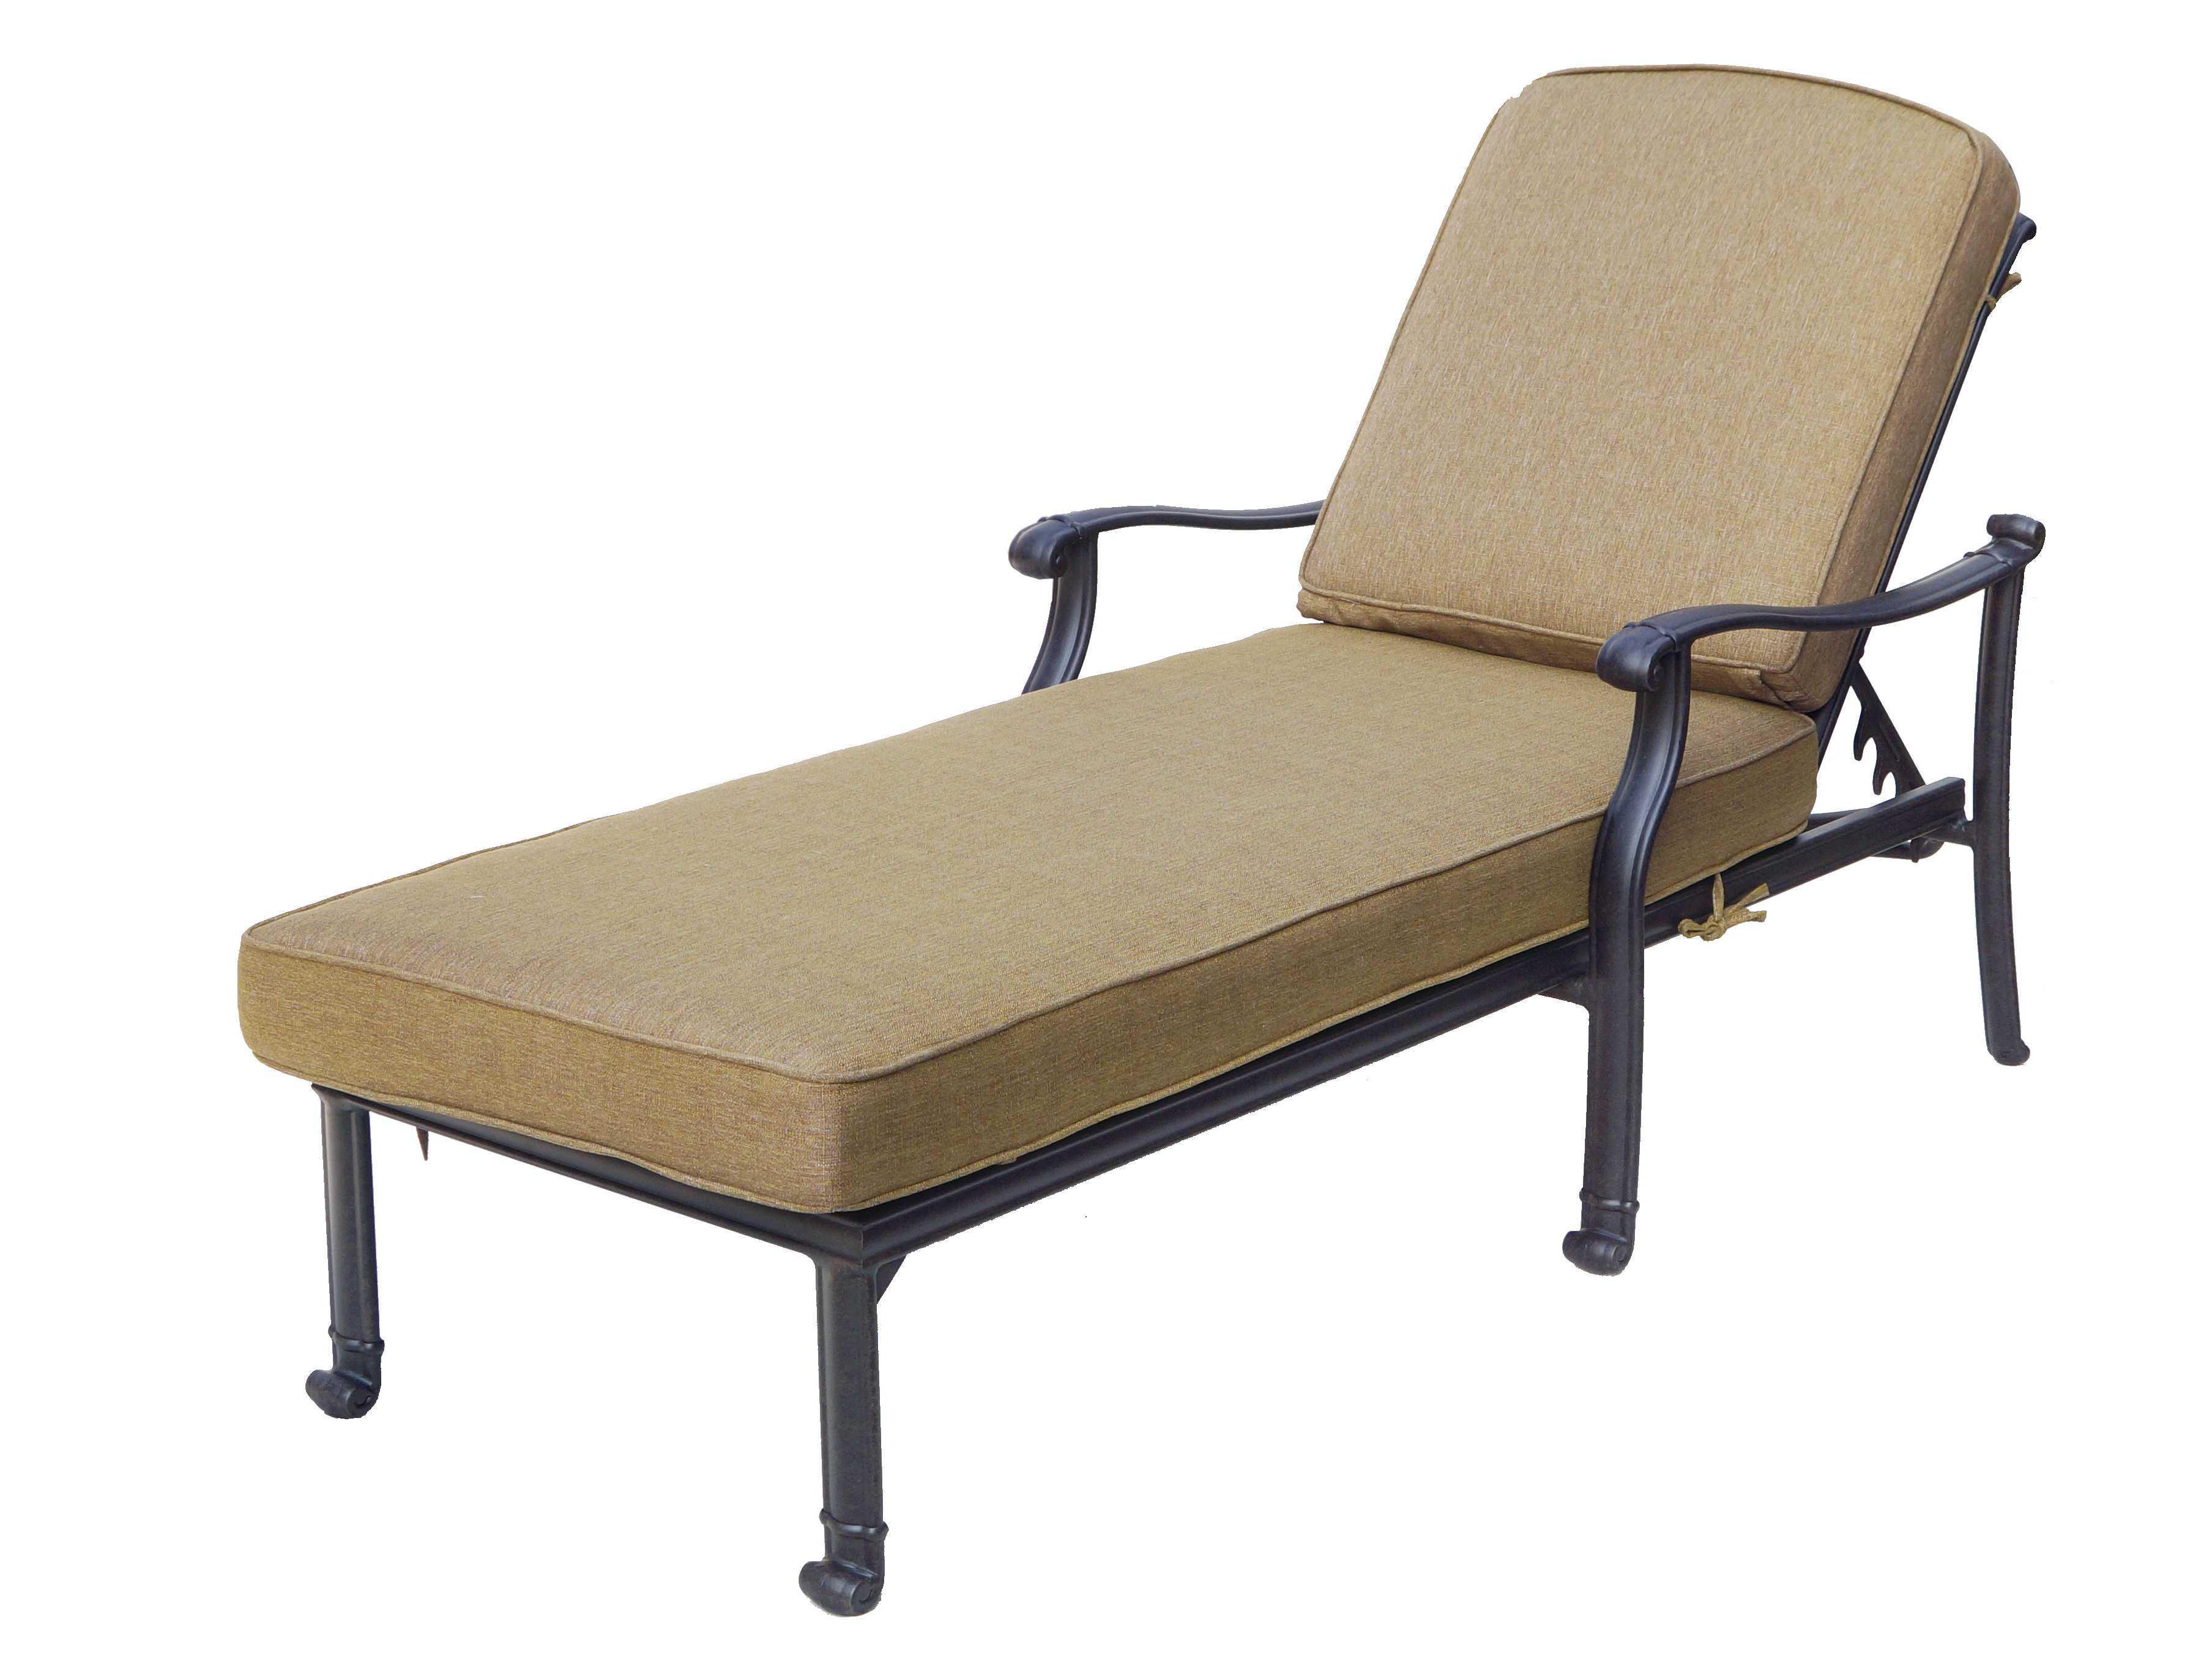 Darlee outdoor living san macros cast aluminum antique for Cast aluminum chaise lounge